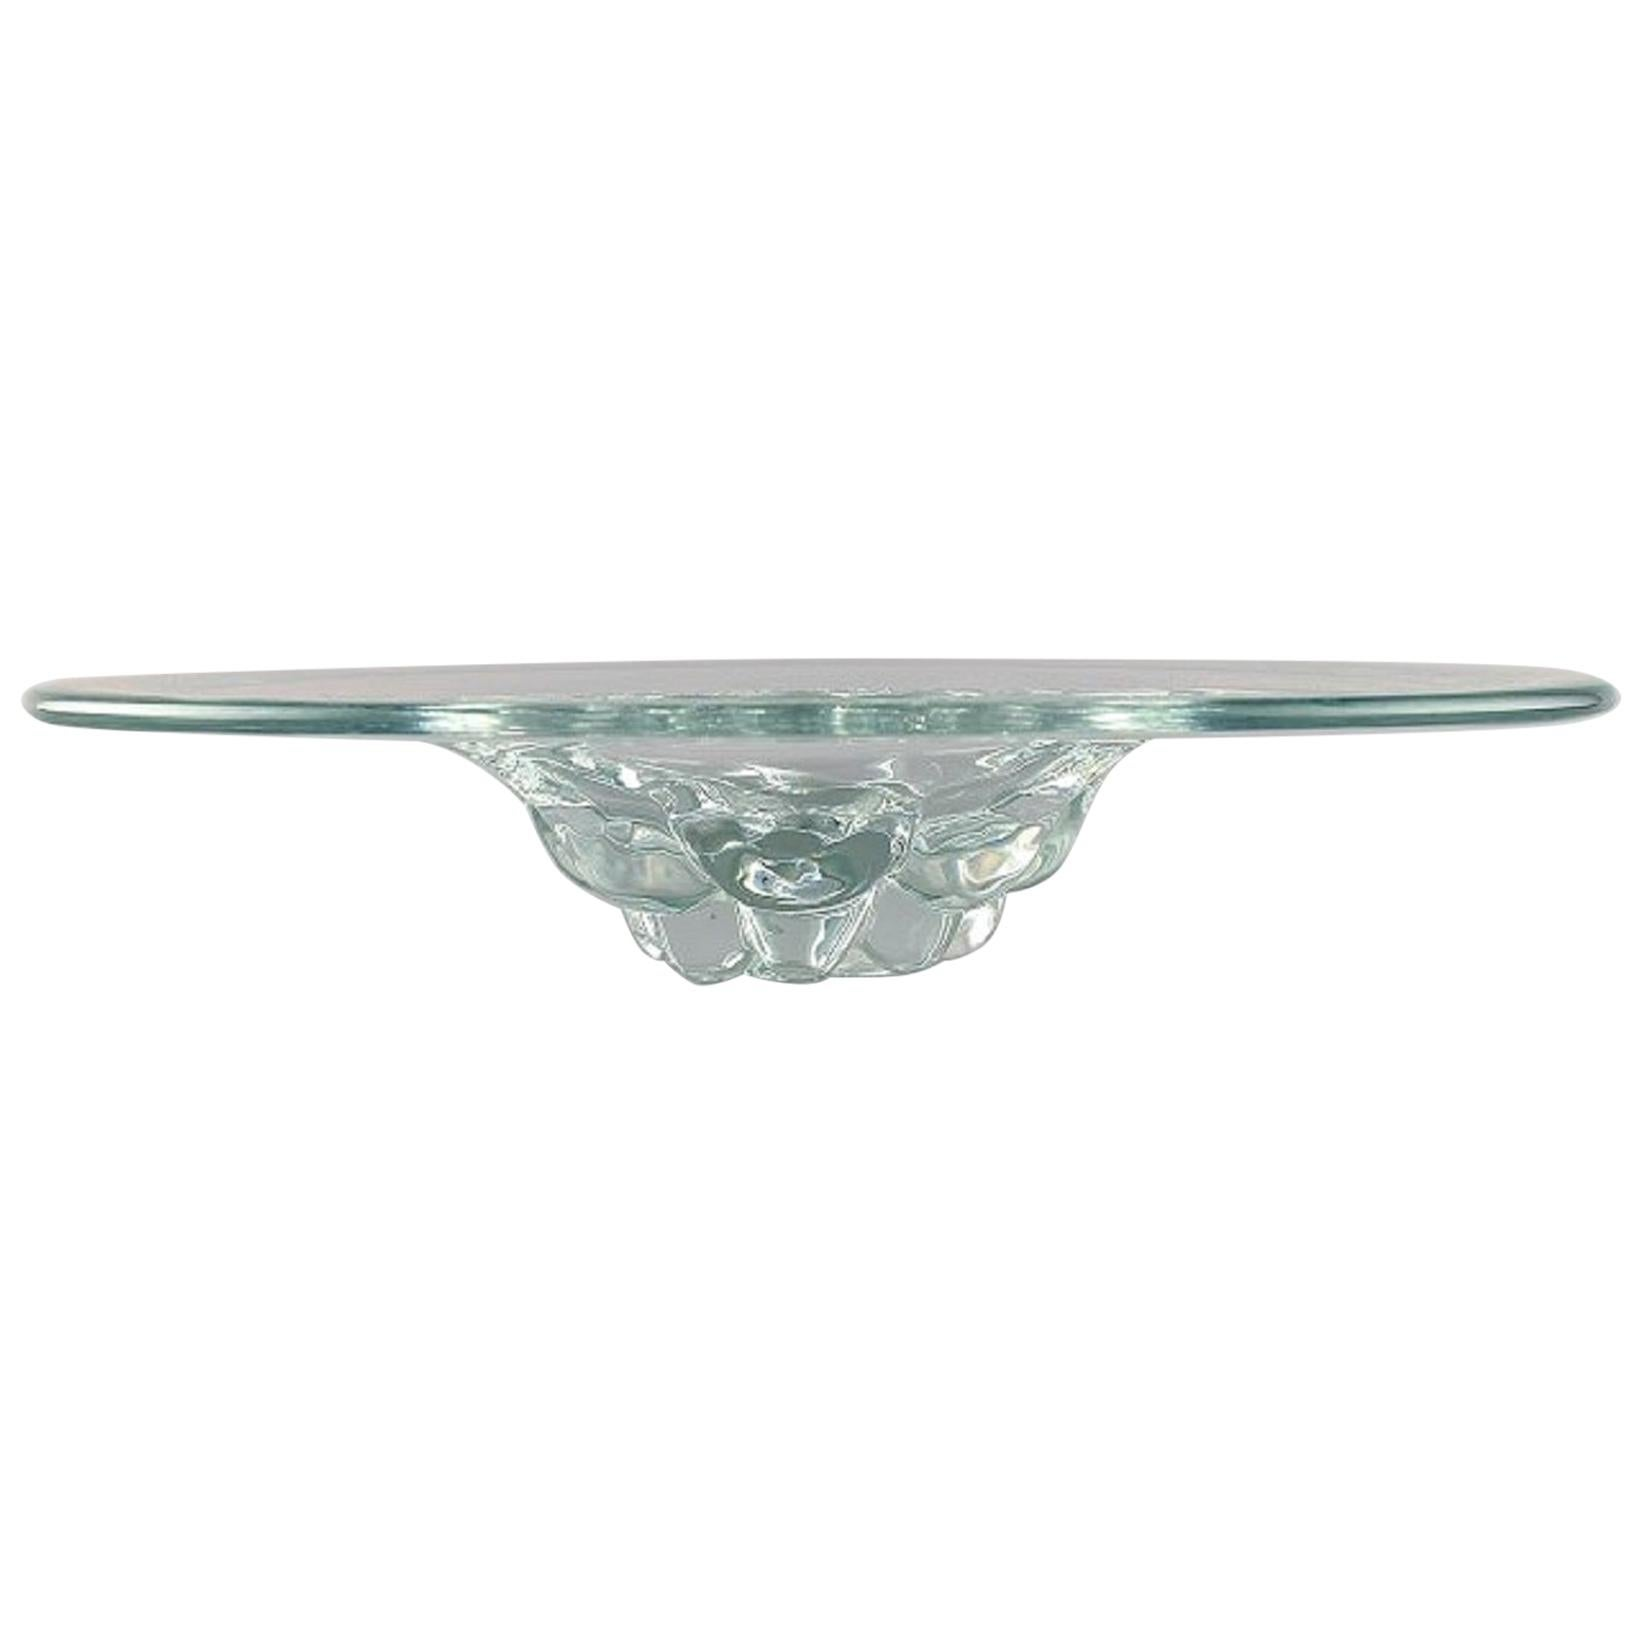 Scandinavian Glass Artist, Large Bowl in Mouth Blown Art Glass, 1960s-1970s